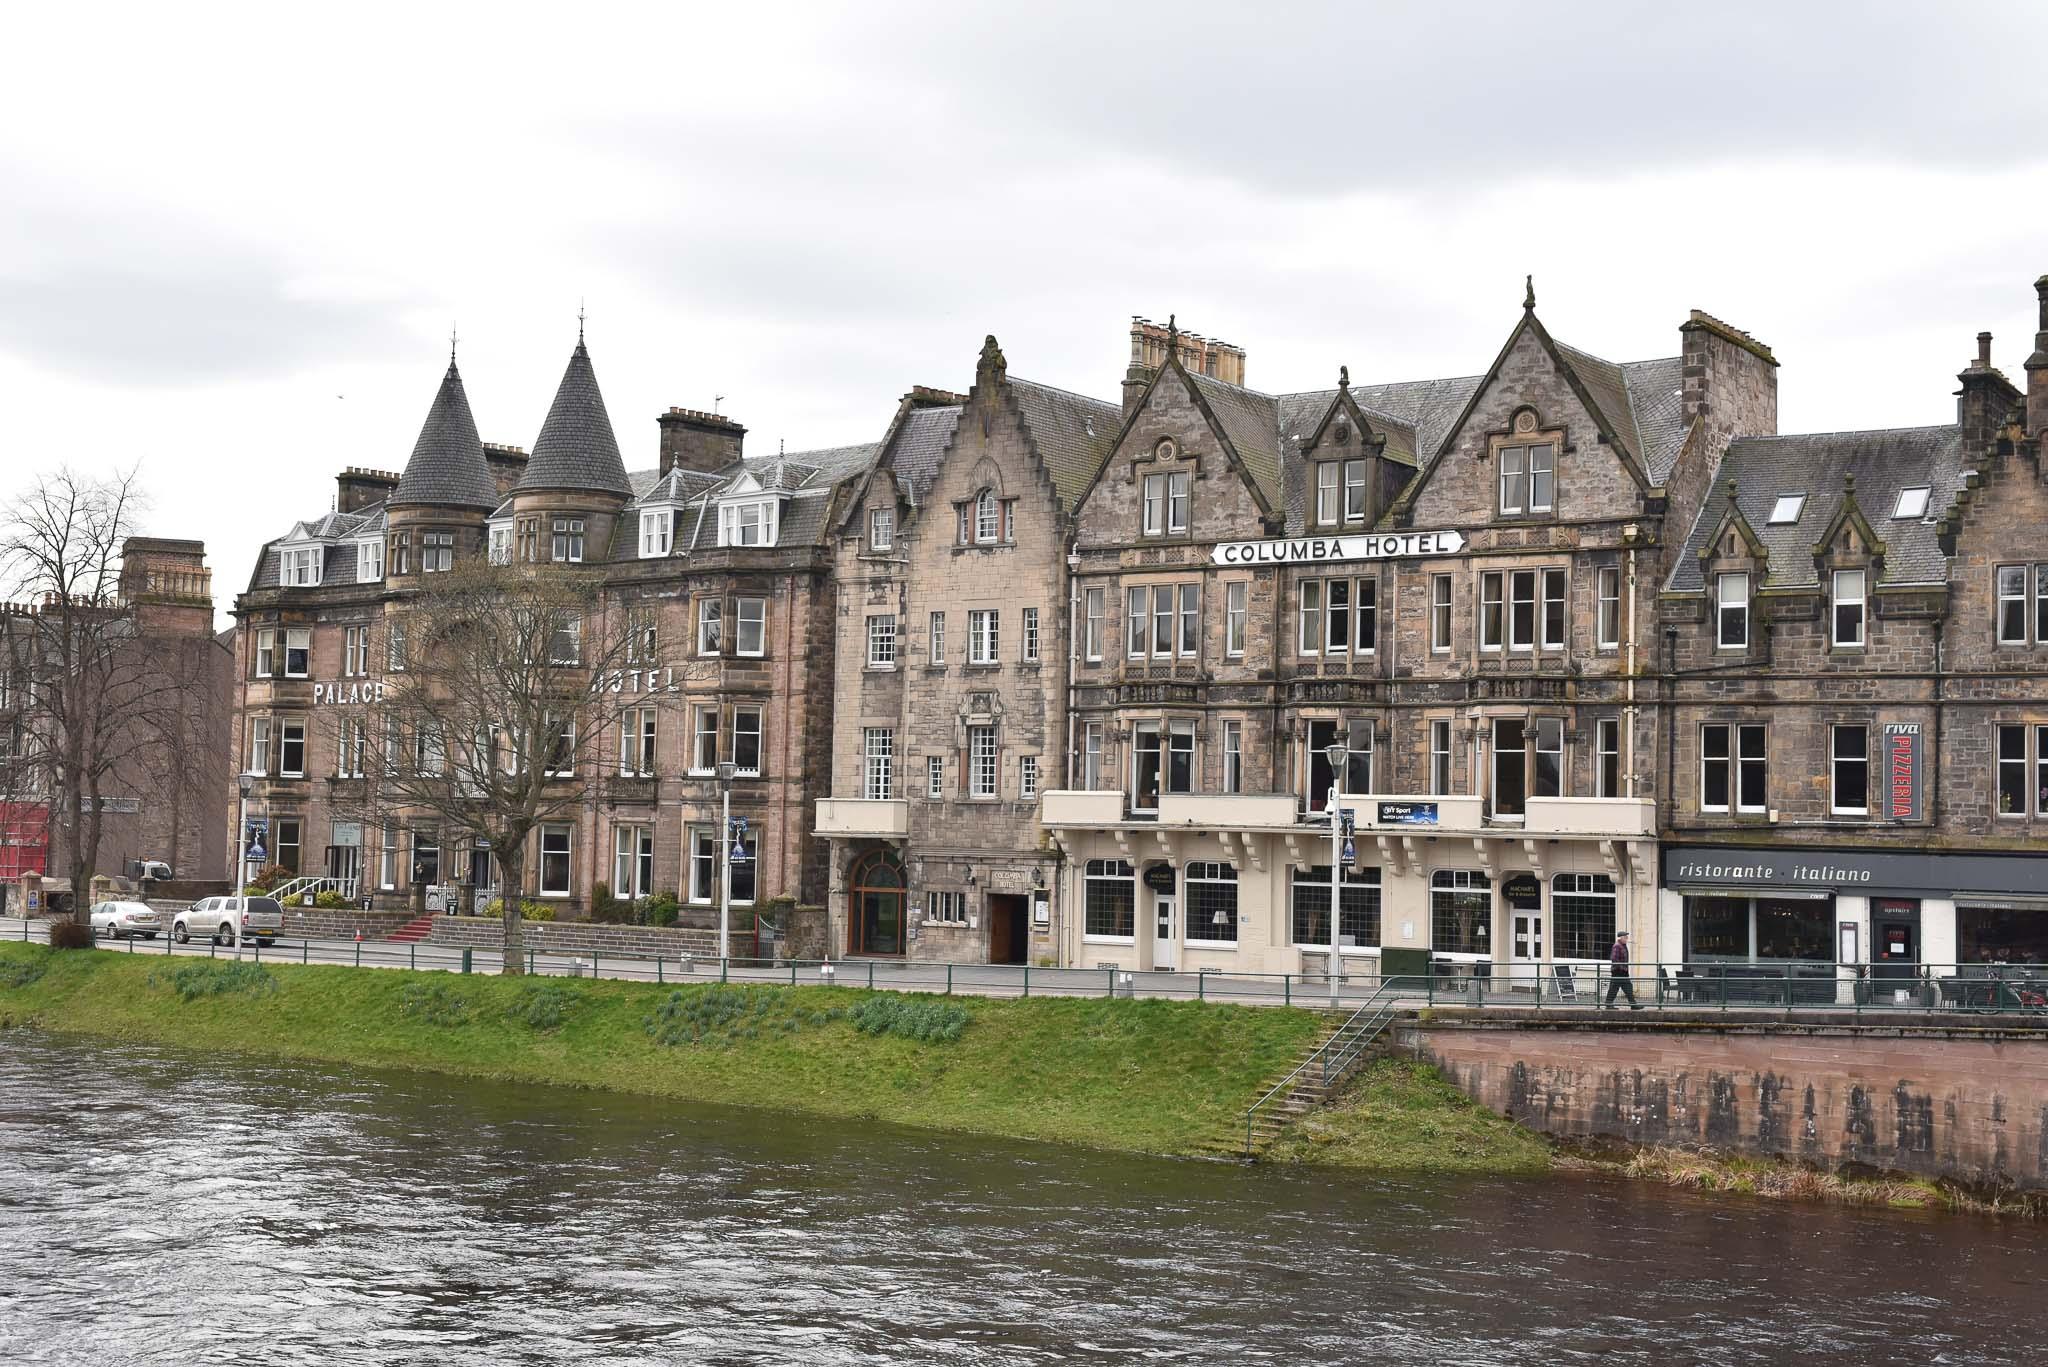 ecosse voyage conseil scotland road trip